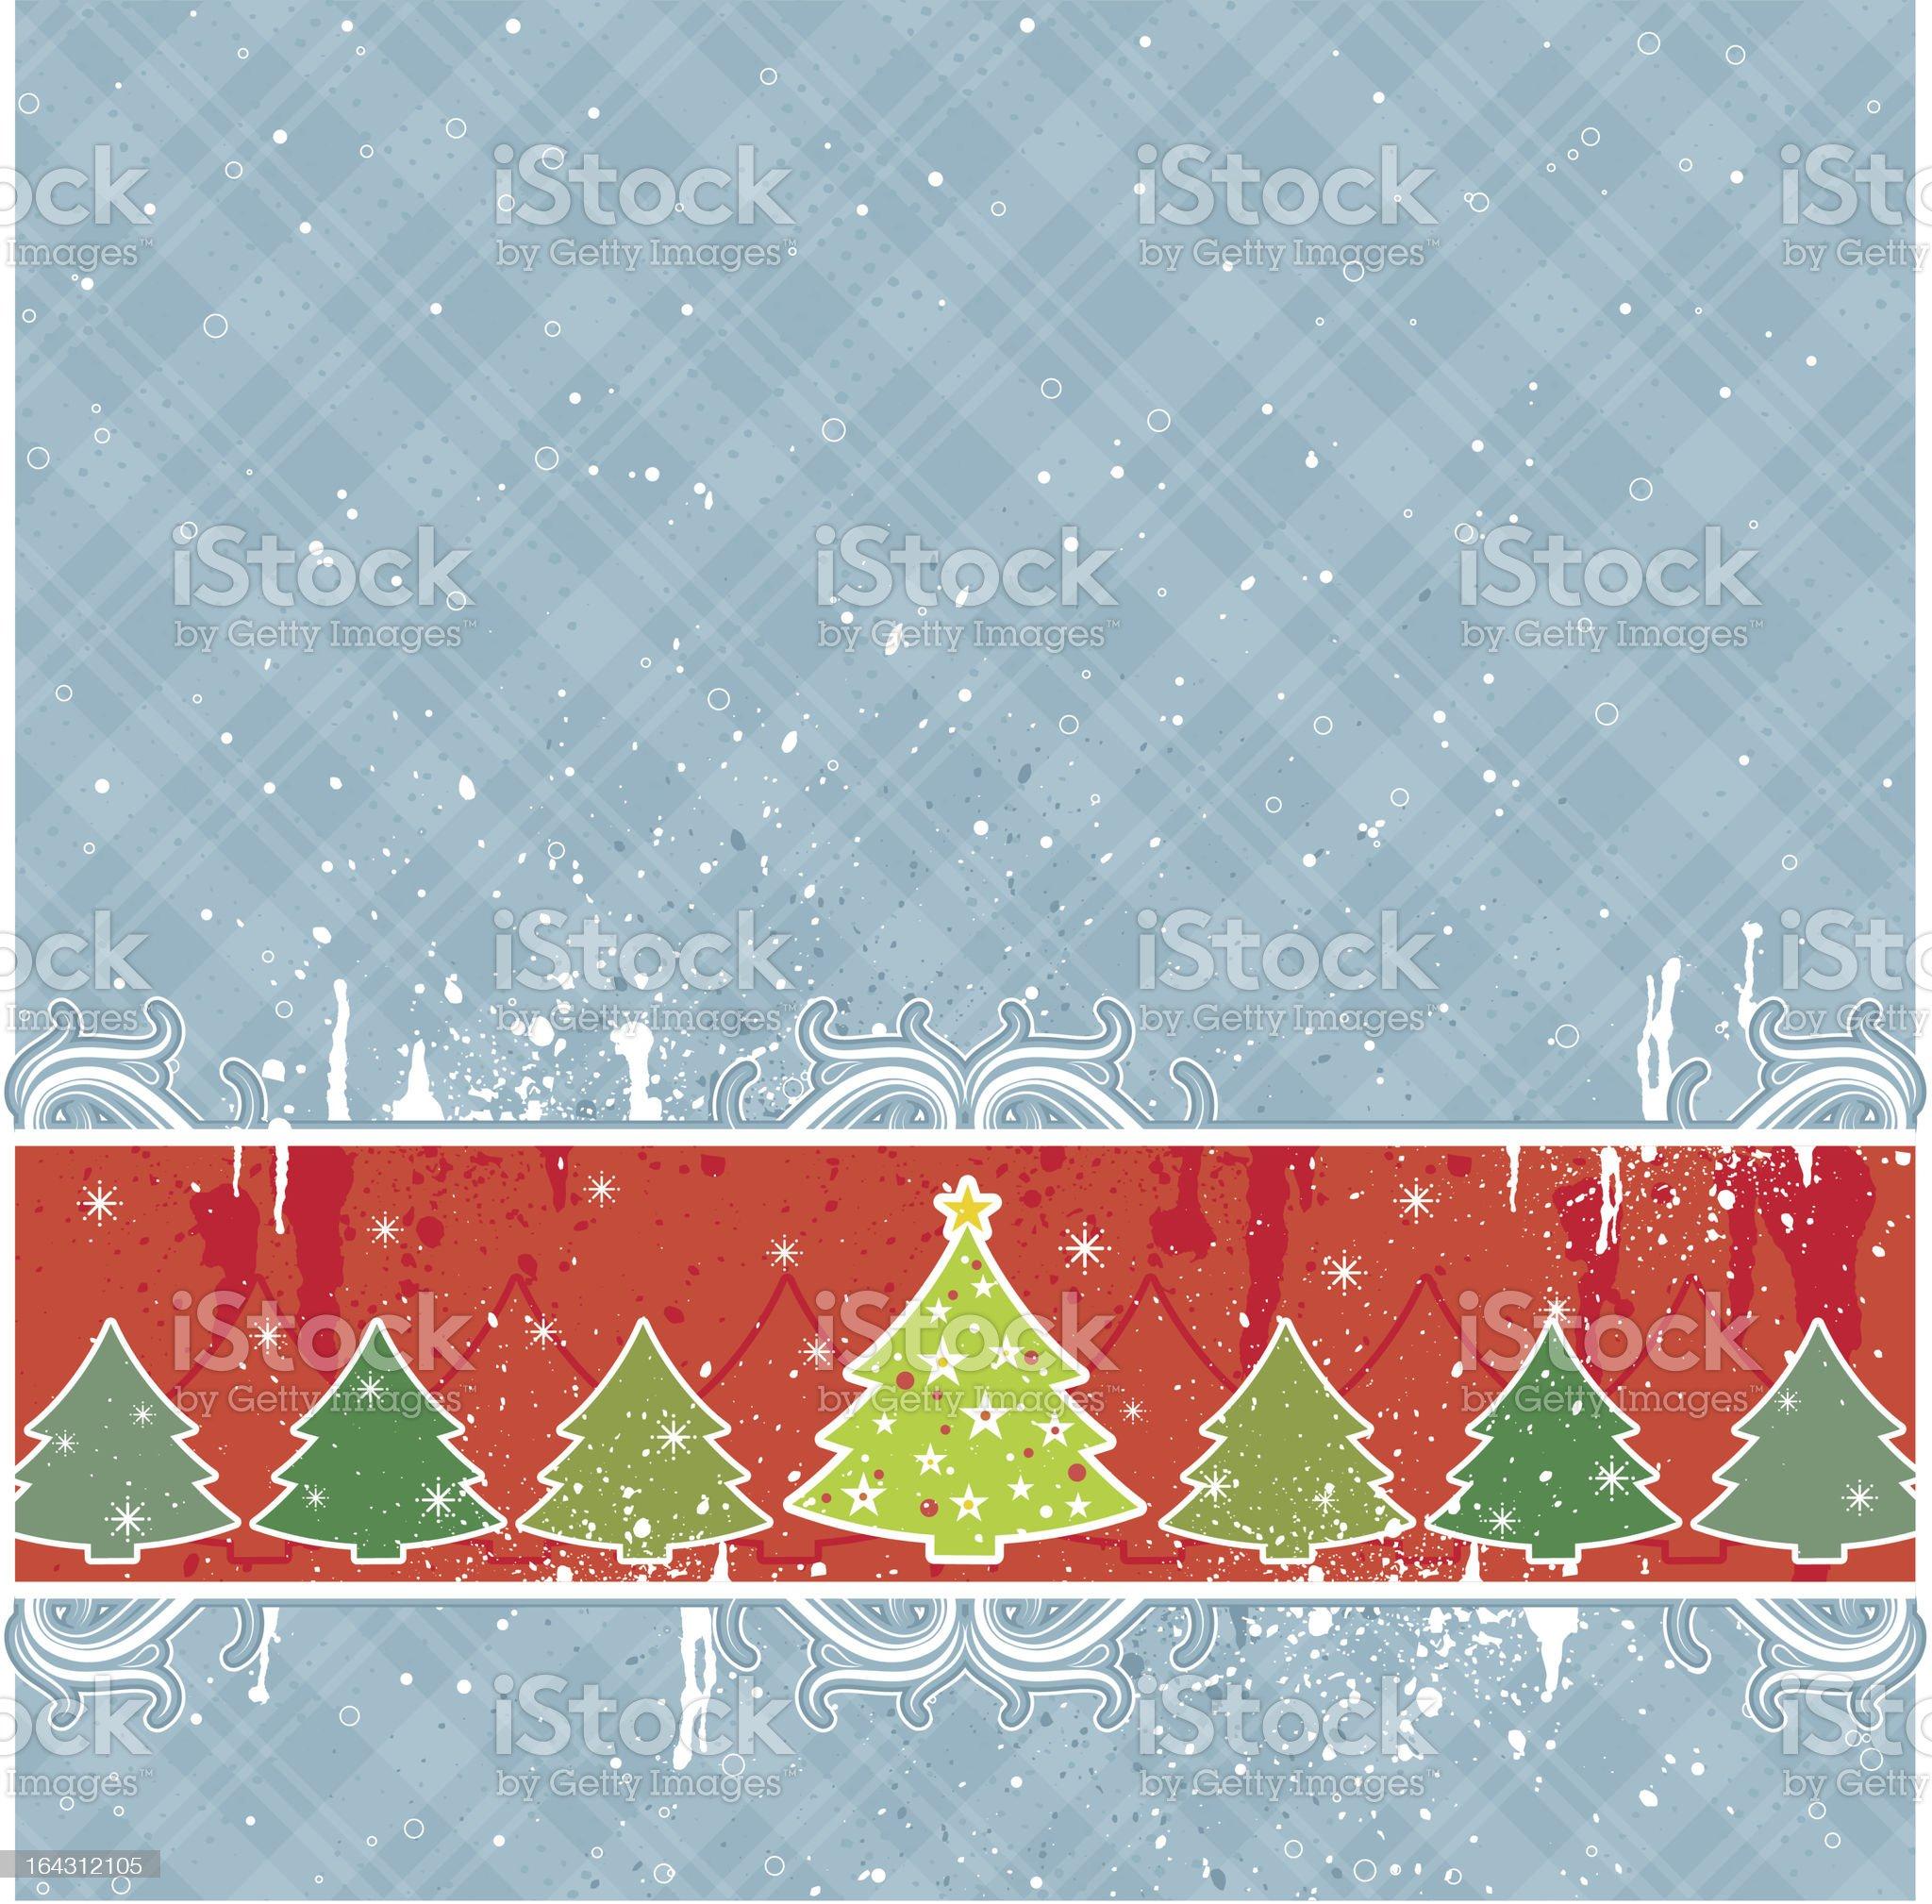 christmas card royalty-free stock vector art